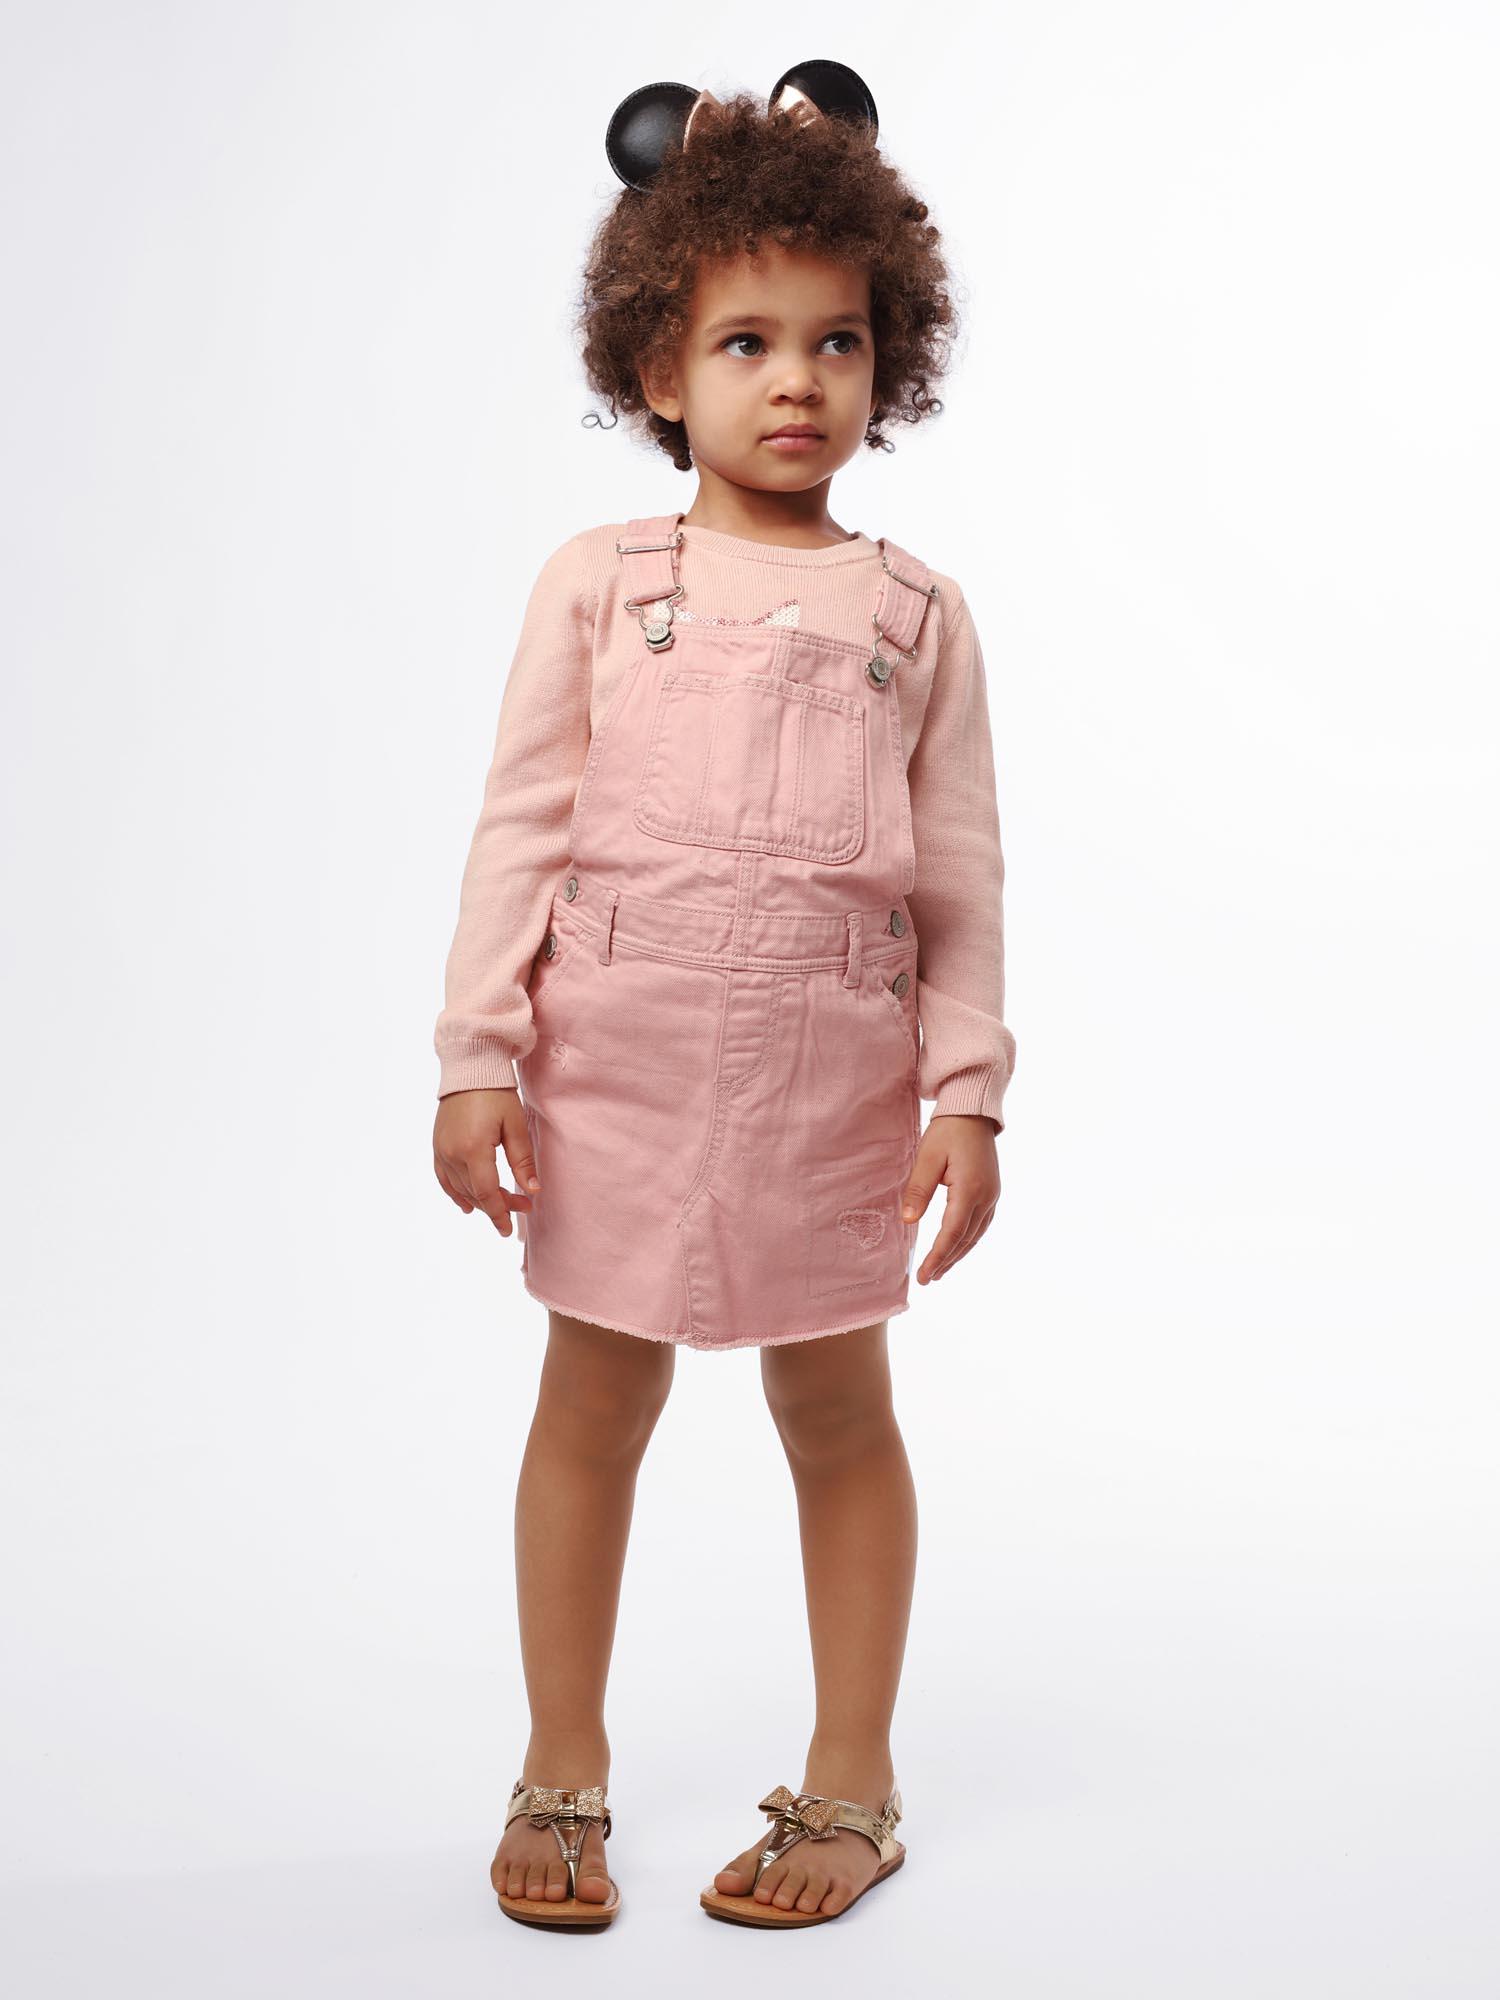 nyc-photographers-kids-modeling-10016.jpg